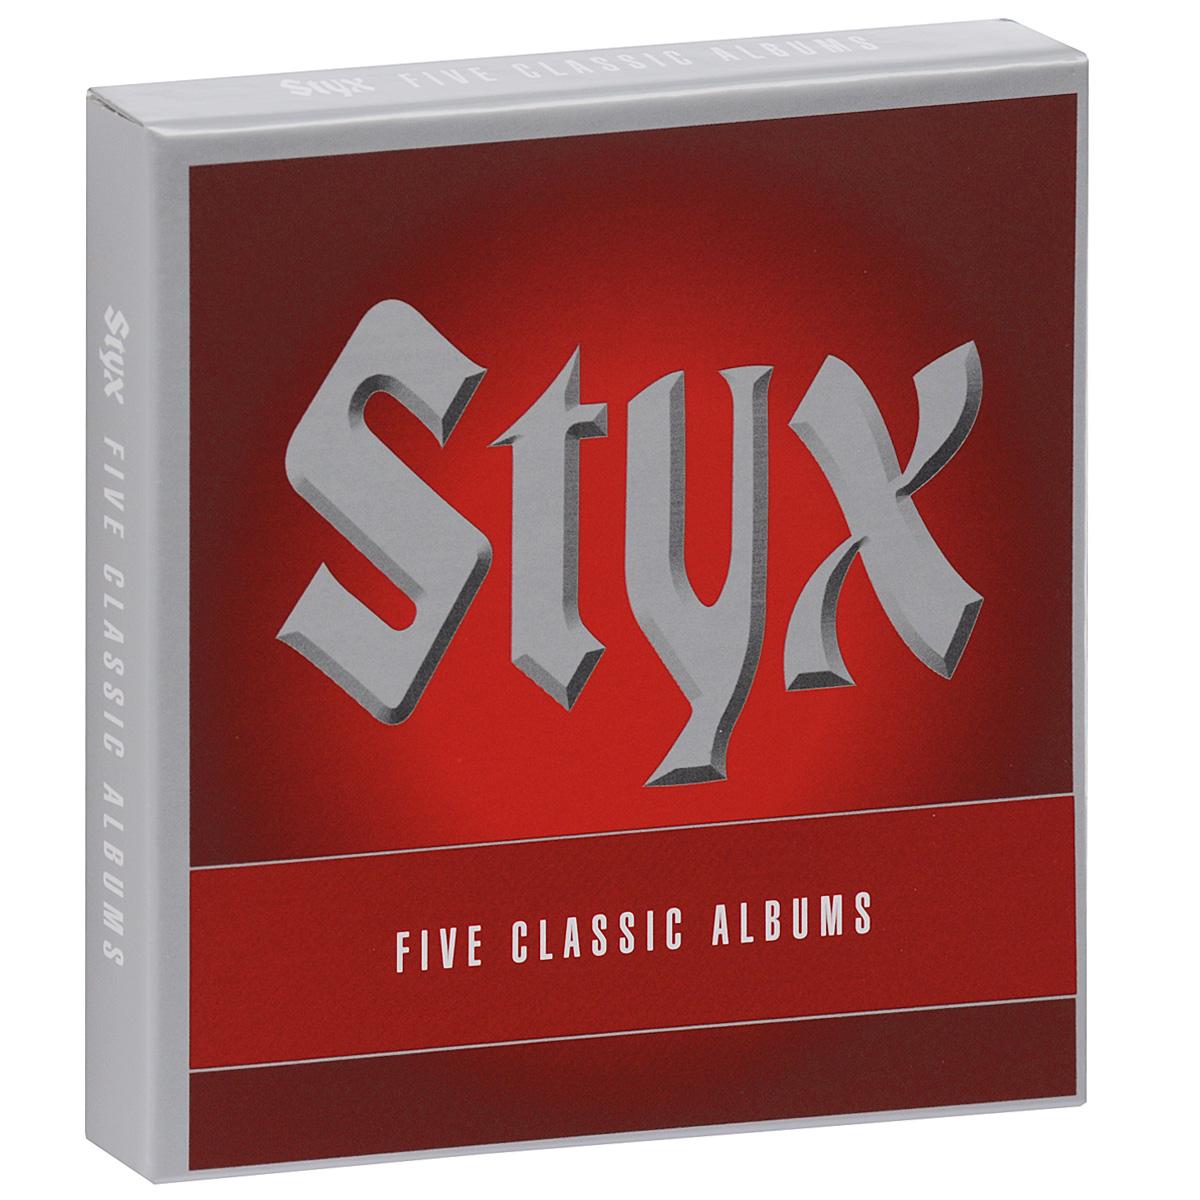 Styx Styx. Five Classic Albums (5 CD) styx styx paradise theater